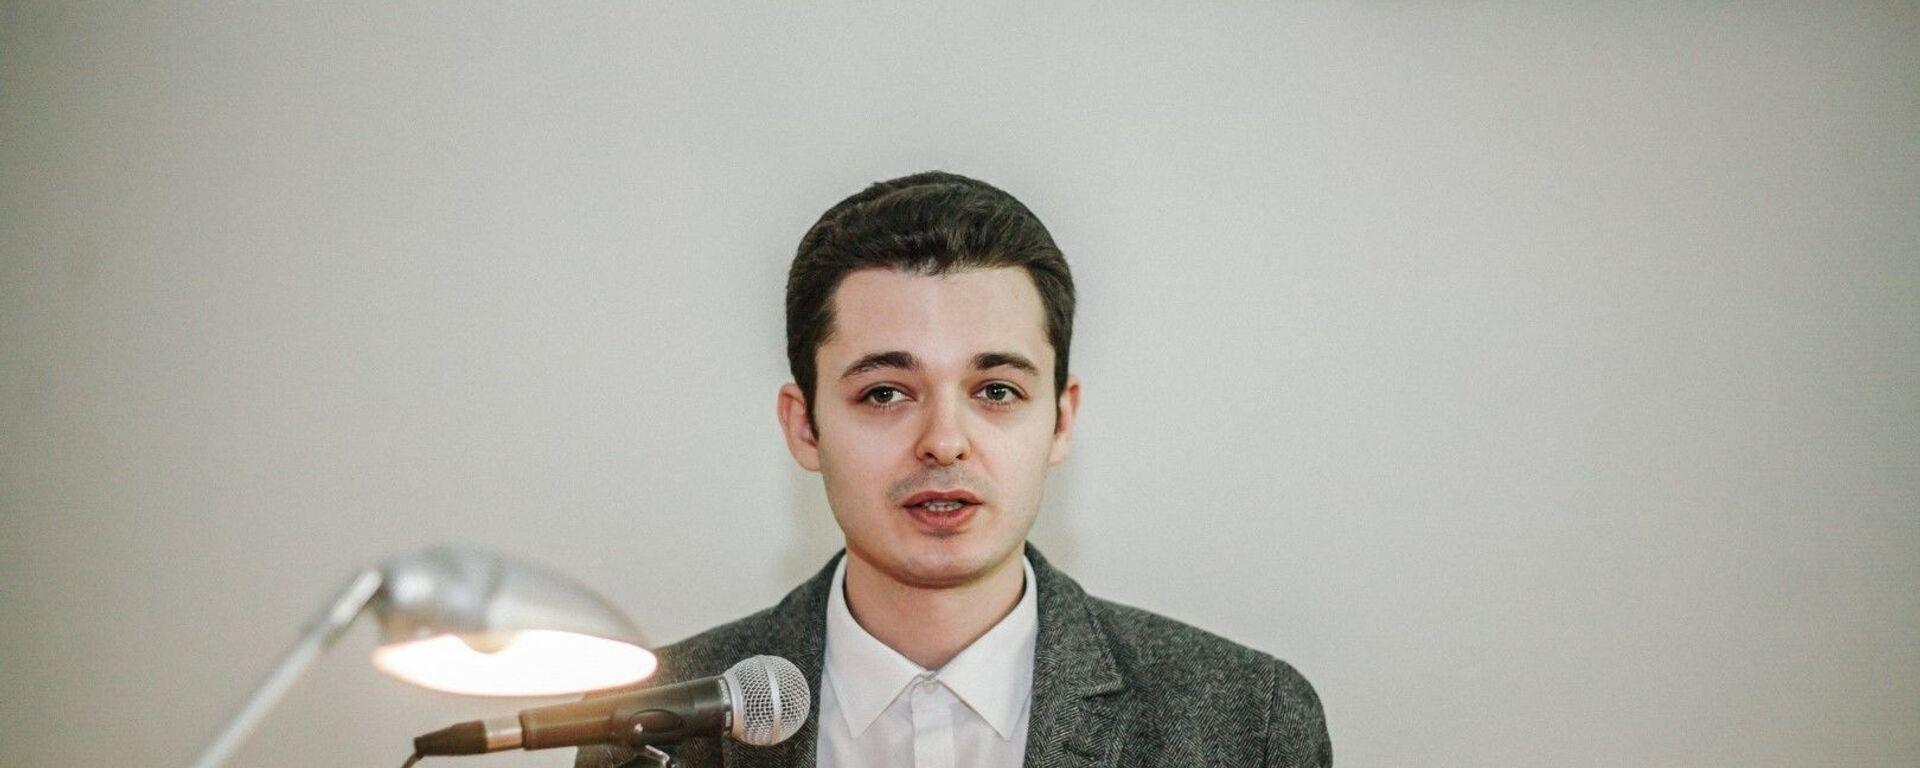 Павел Фельдман - Sputnik Латвия, 1920, 26.04.2021